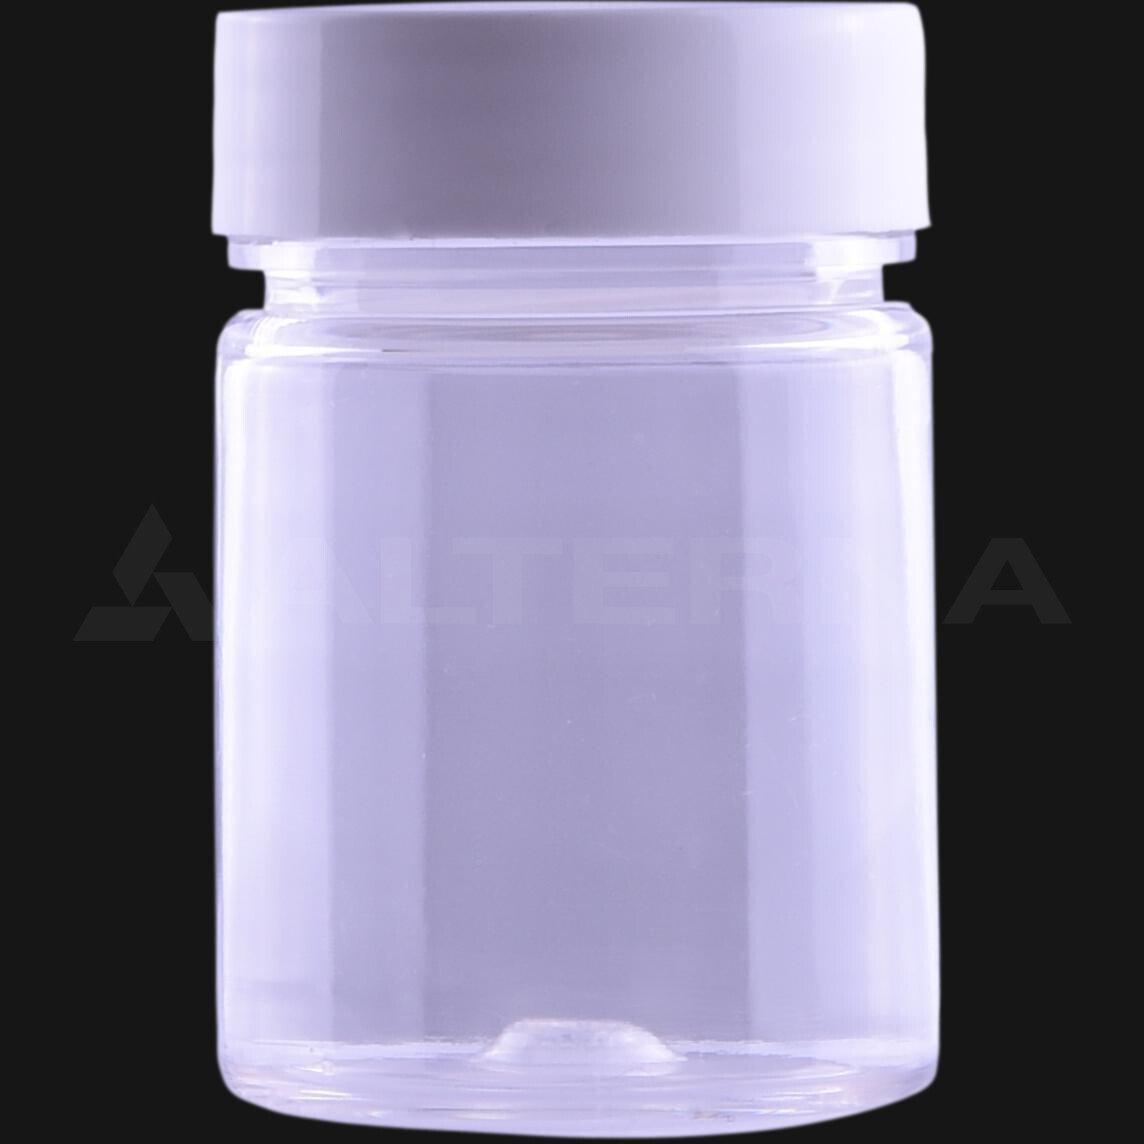 50 ml PET Pill Bottle with 38 mm Alu. Foil Seal Cap